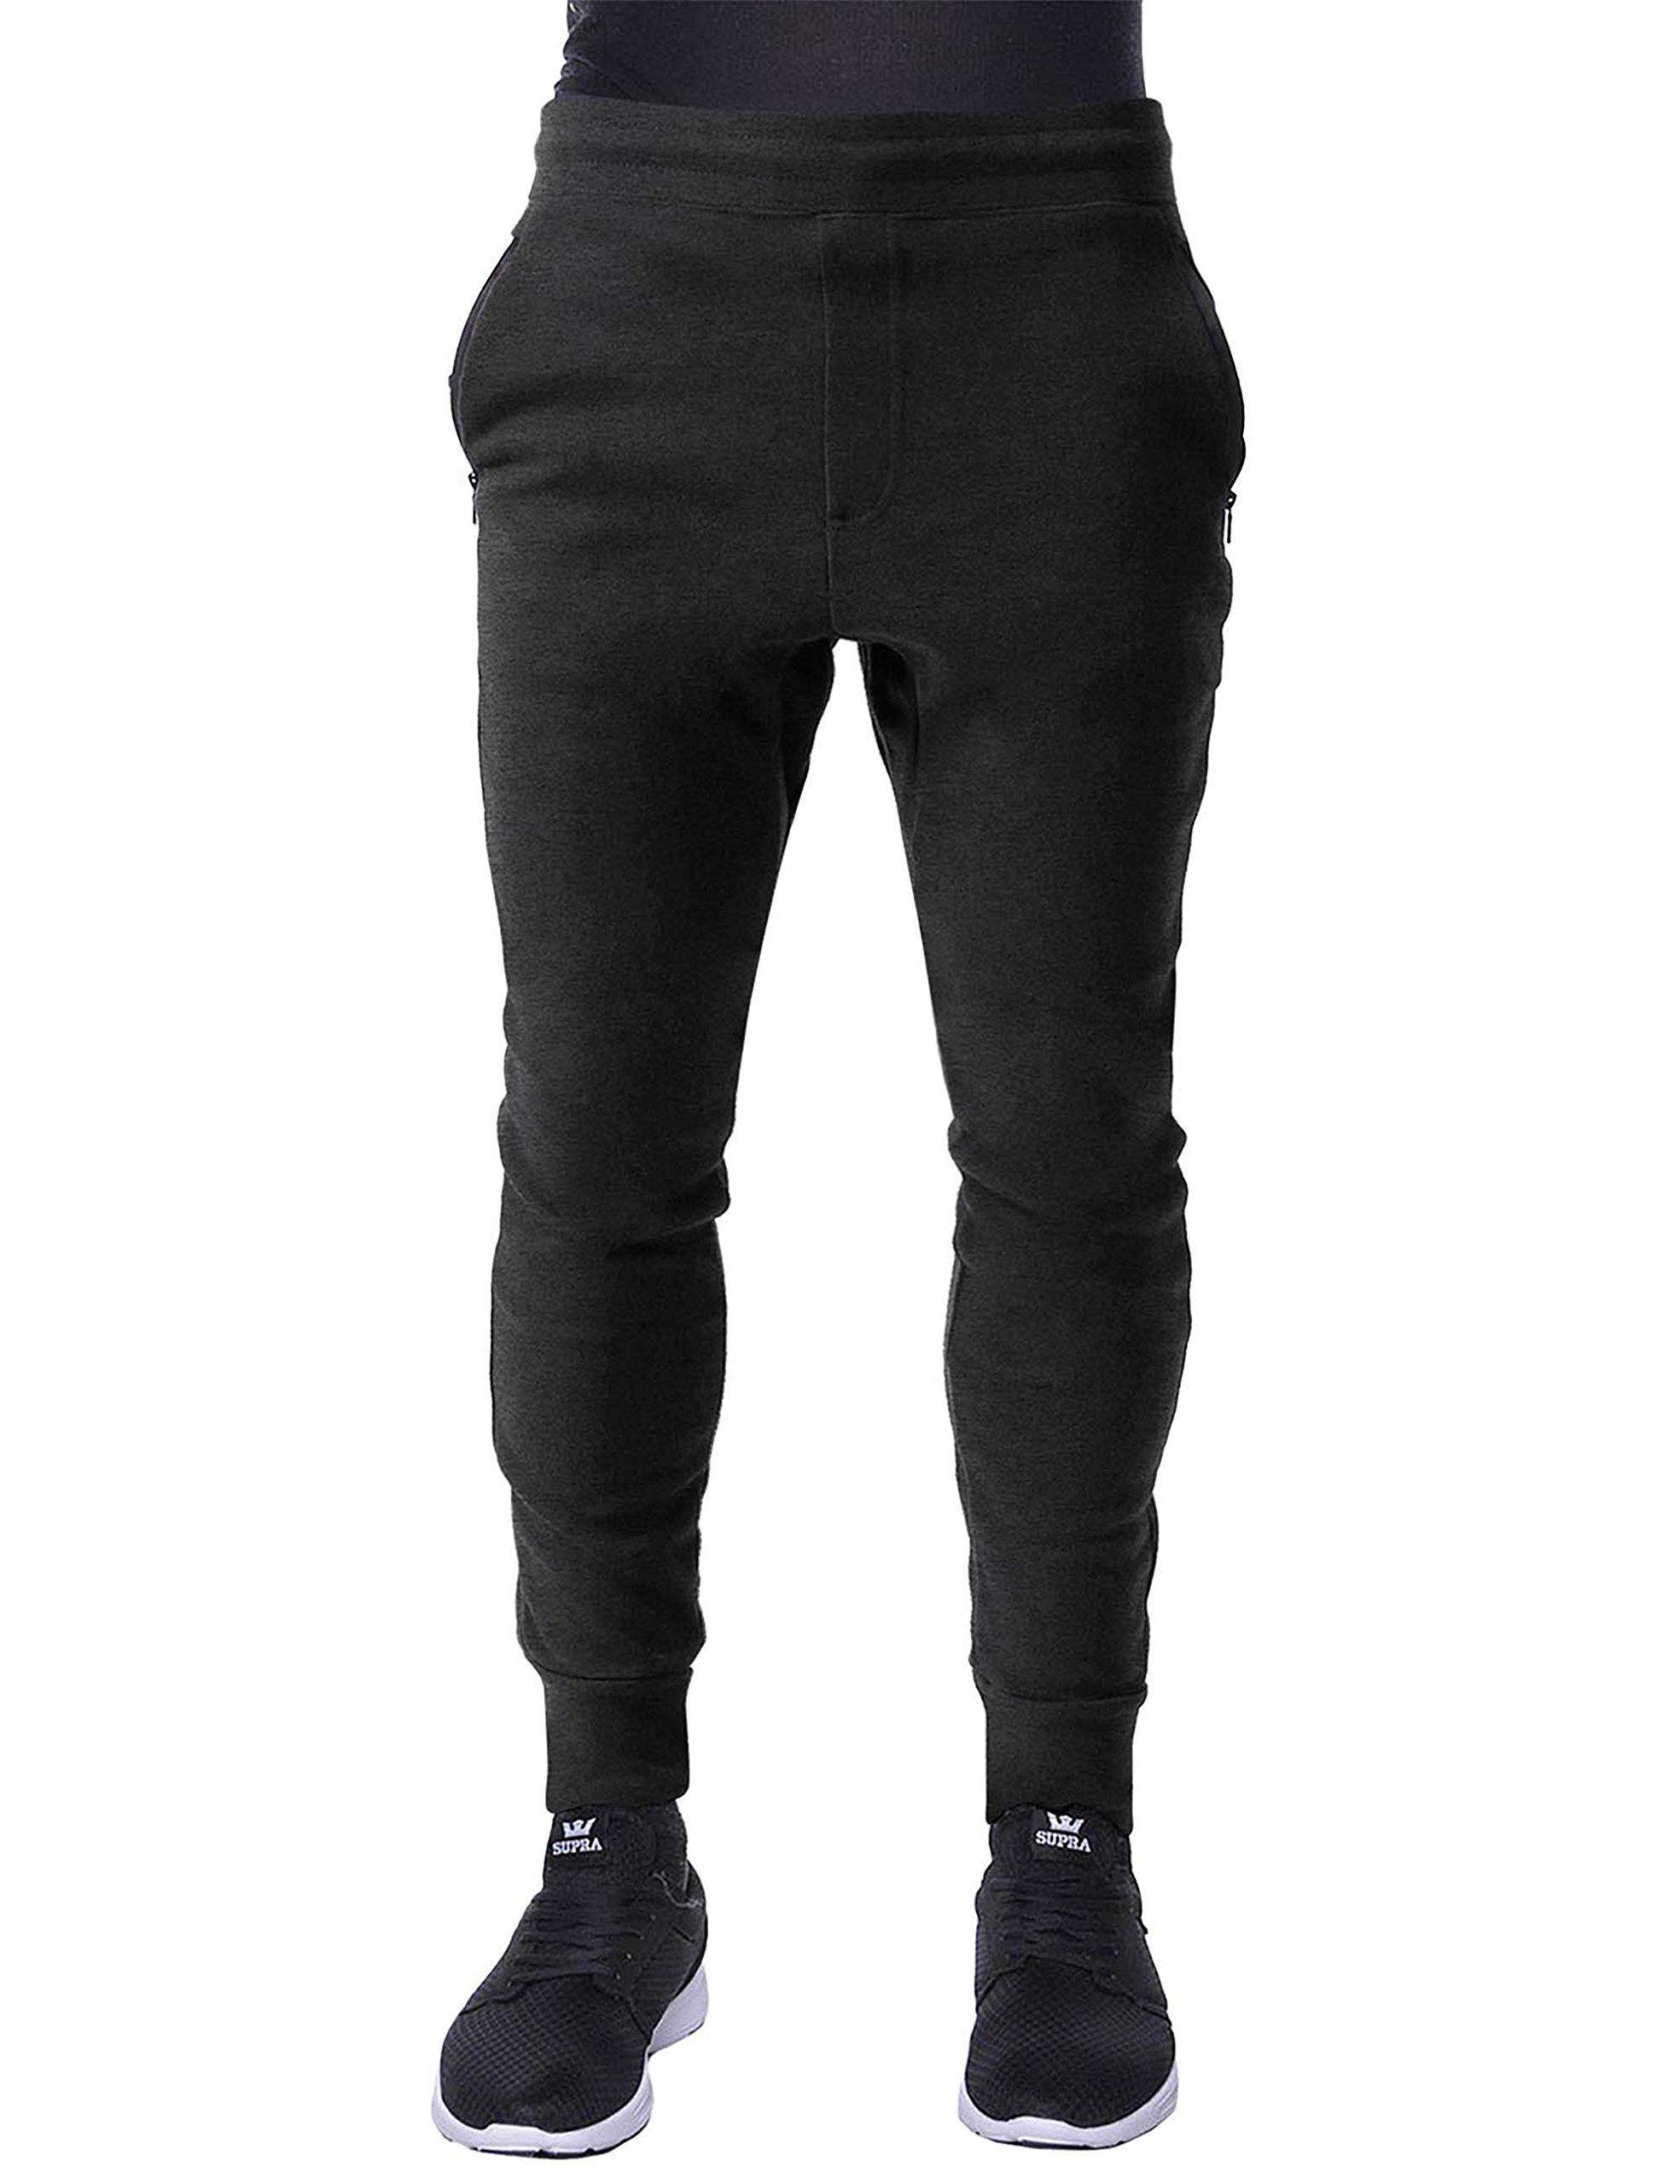 Hat and Beyond Mens Fleece Jogger Pants Elastic Active Basic Urban Harem Slim Fit (Medium, IPJ089 Charcoal)